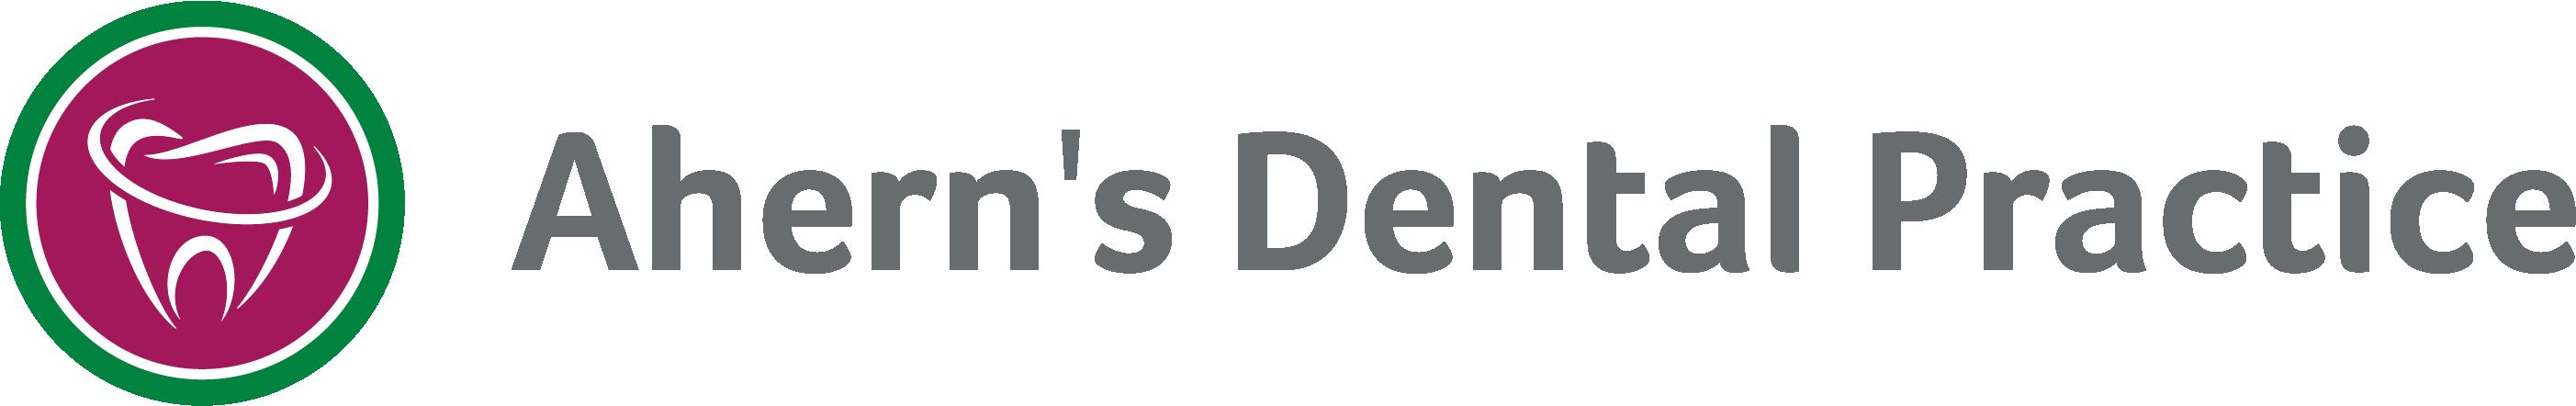 Ahern's Dental Practice Logo